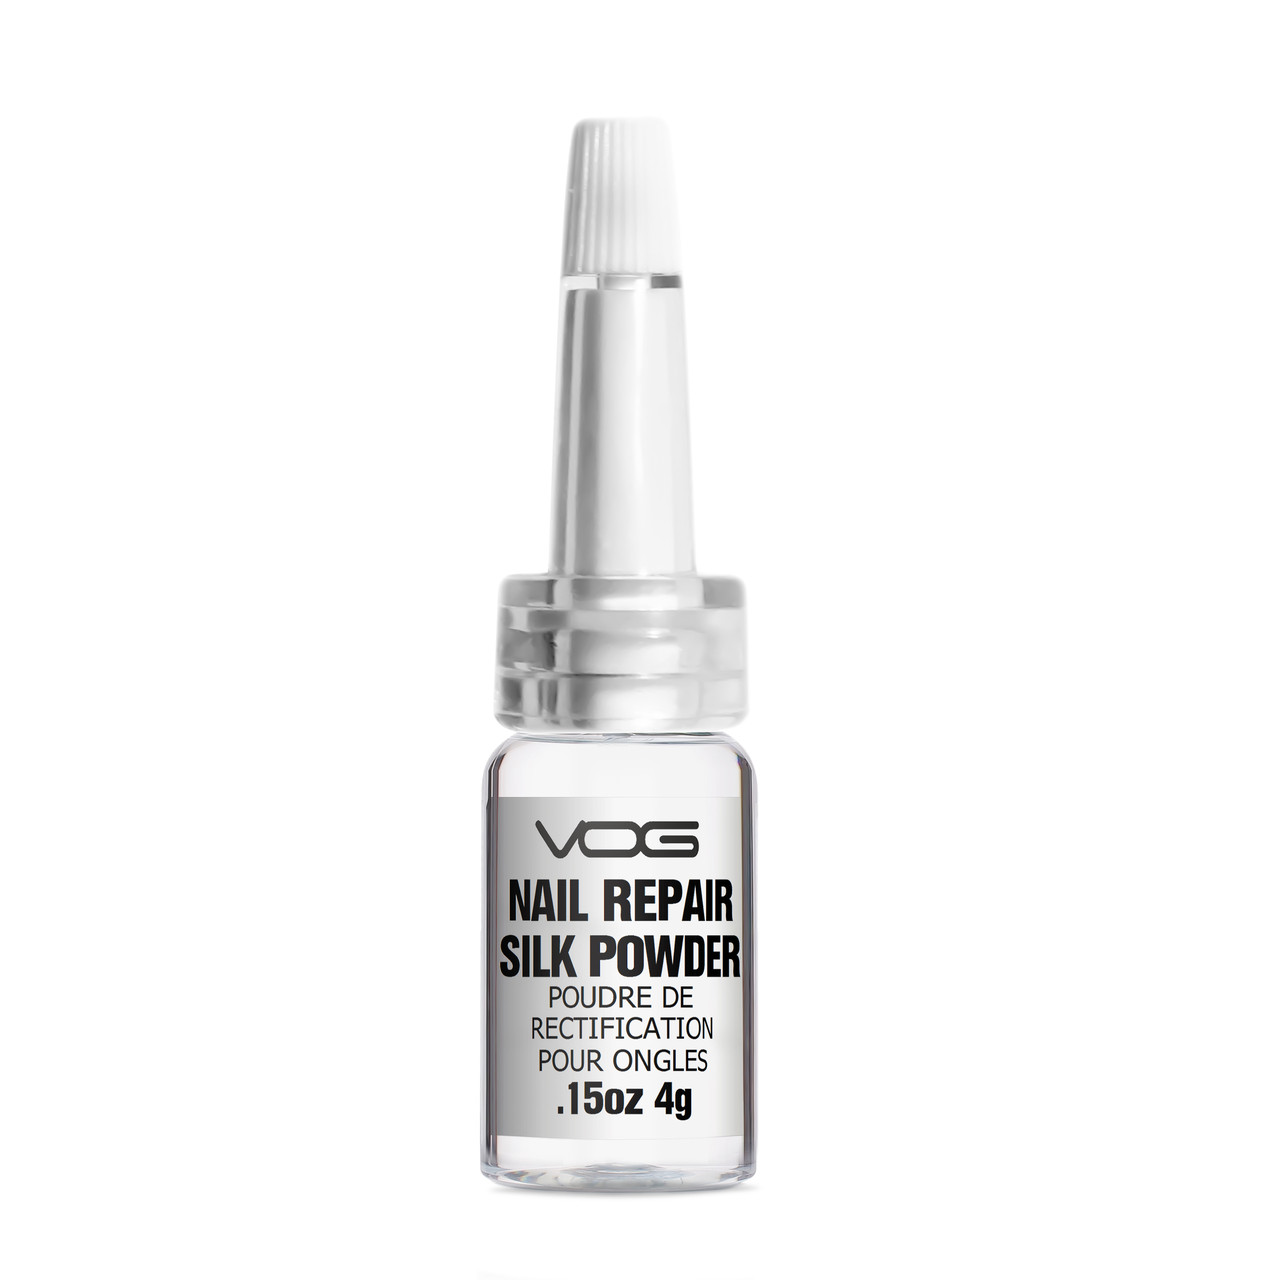 Шёлковая пудра для ремонта ногтей в виде порошка Nail Repair Silk Powder 4гр VOG США